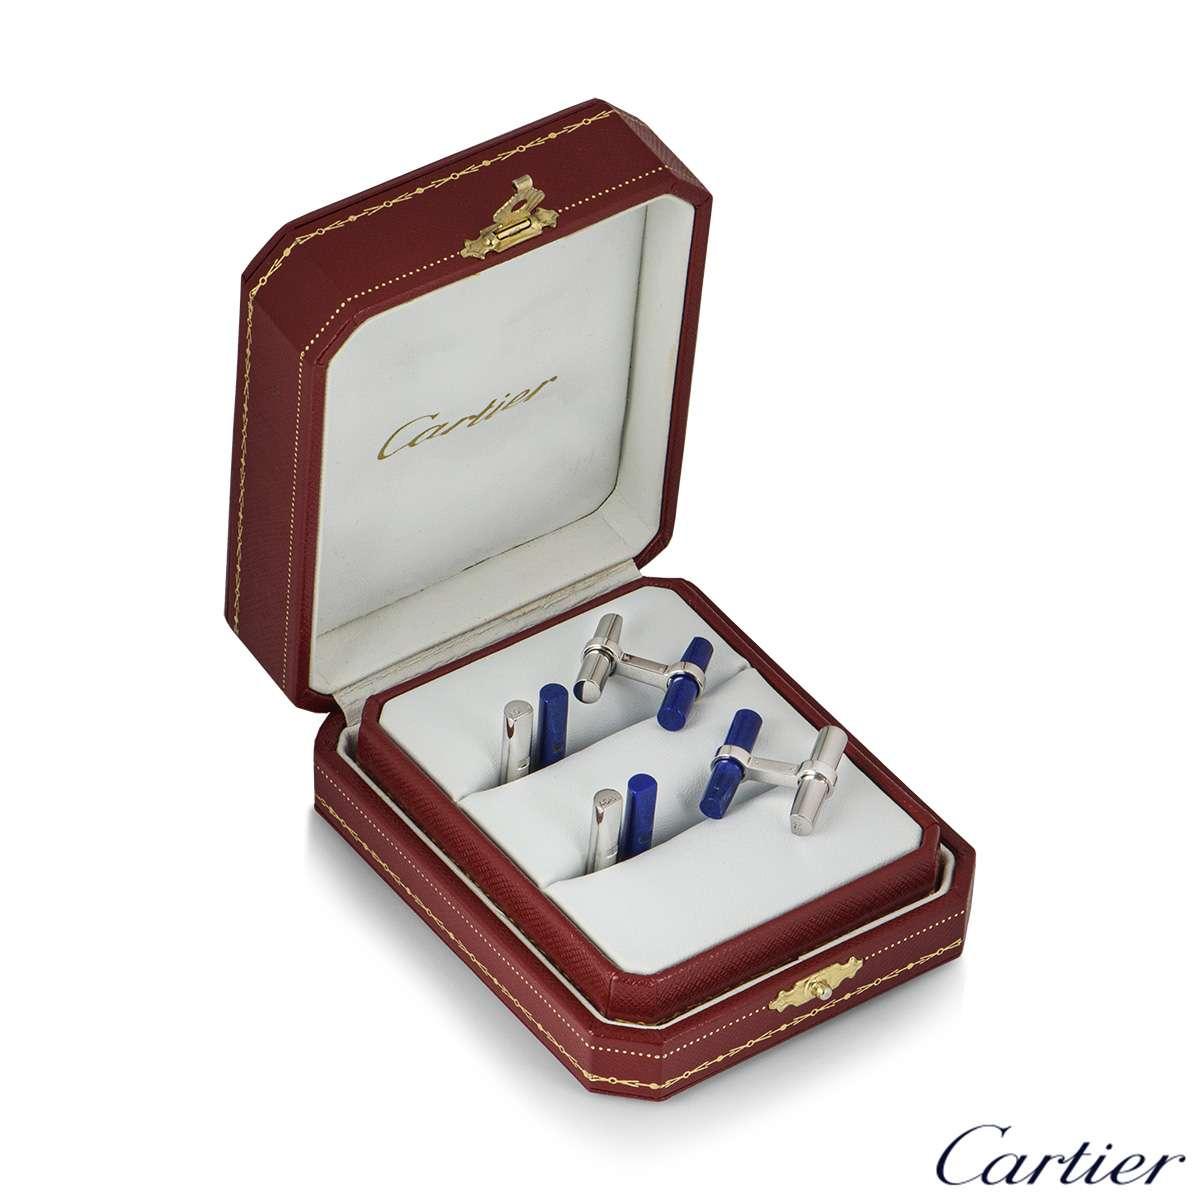 Cartier White Gold, Steel and Lapis Lazuli Cufflinks